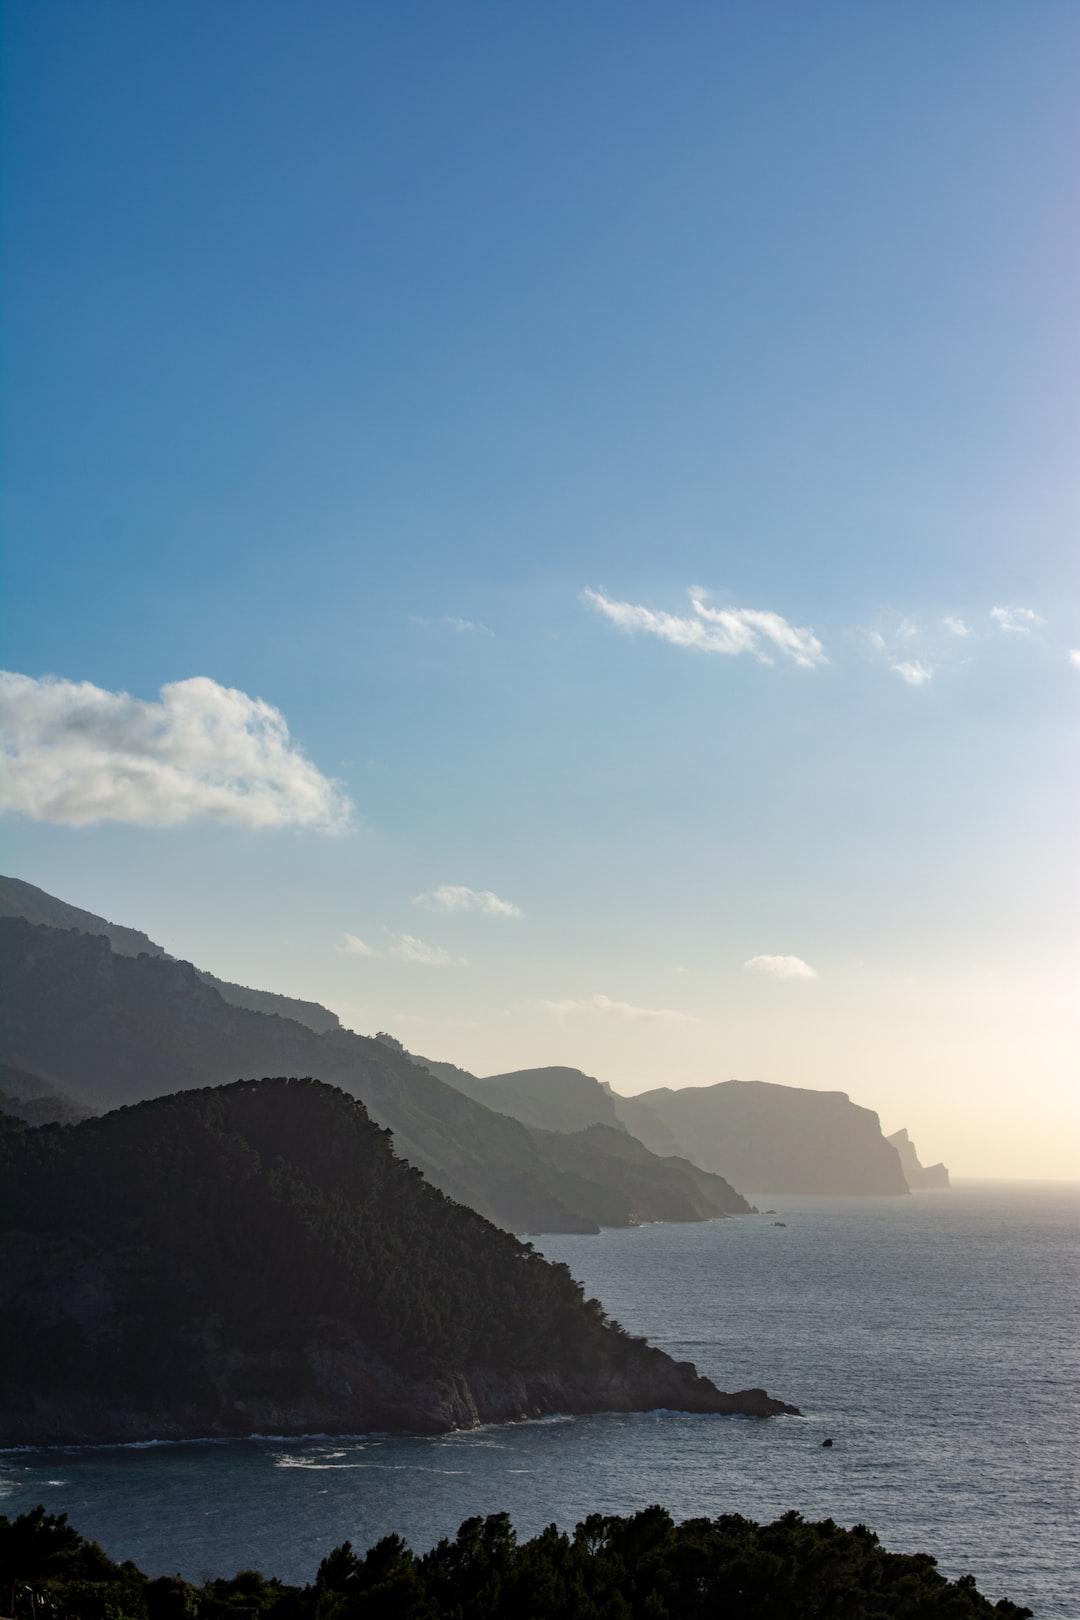 Misty cliffs during sunset